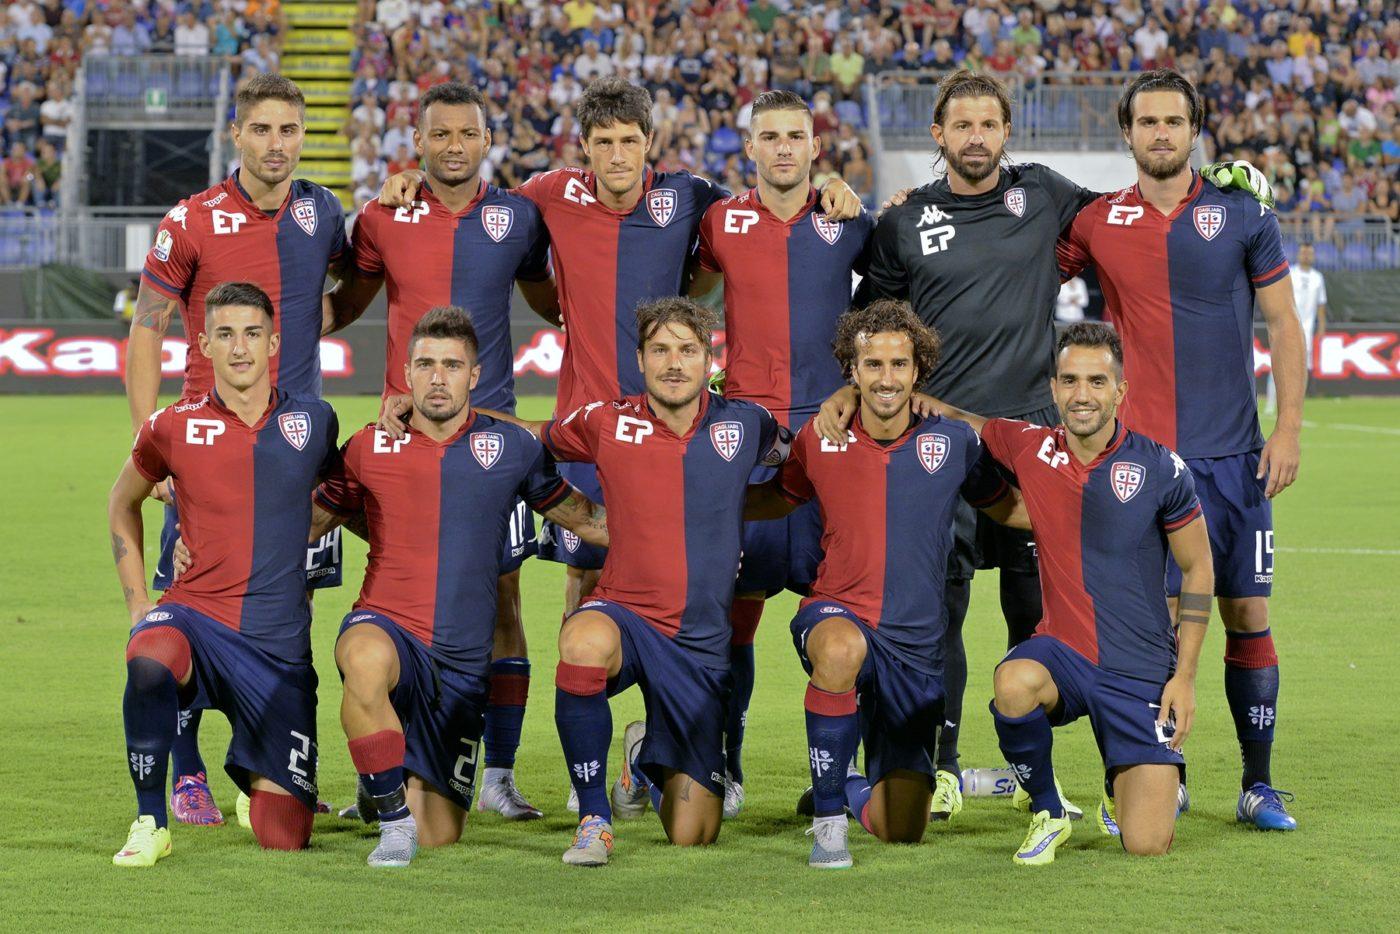 Kto walczy o awans do Serie A?